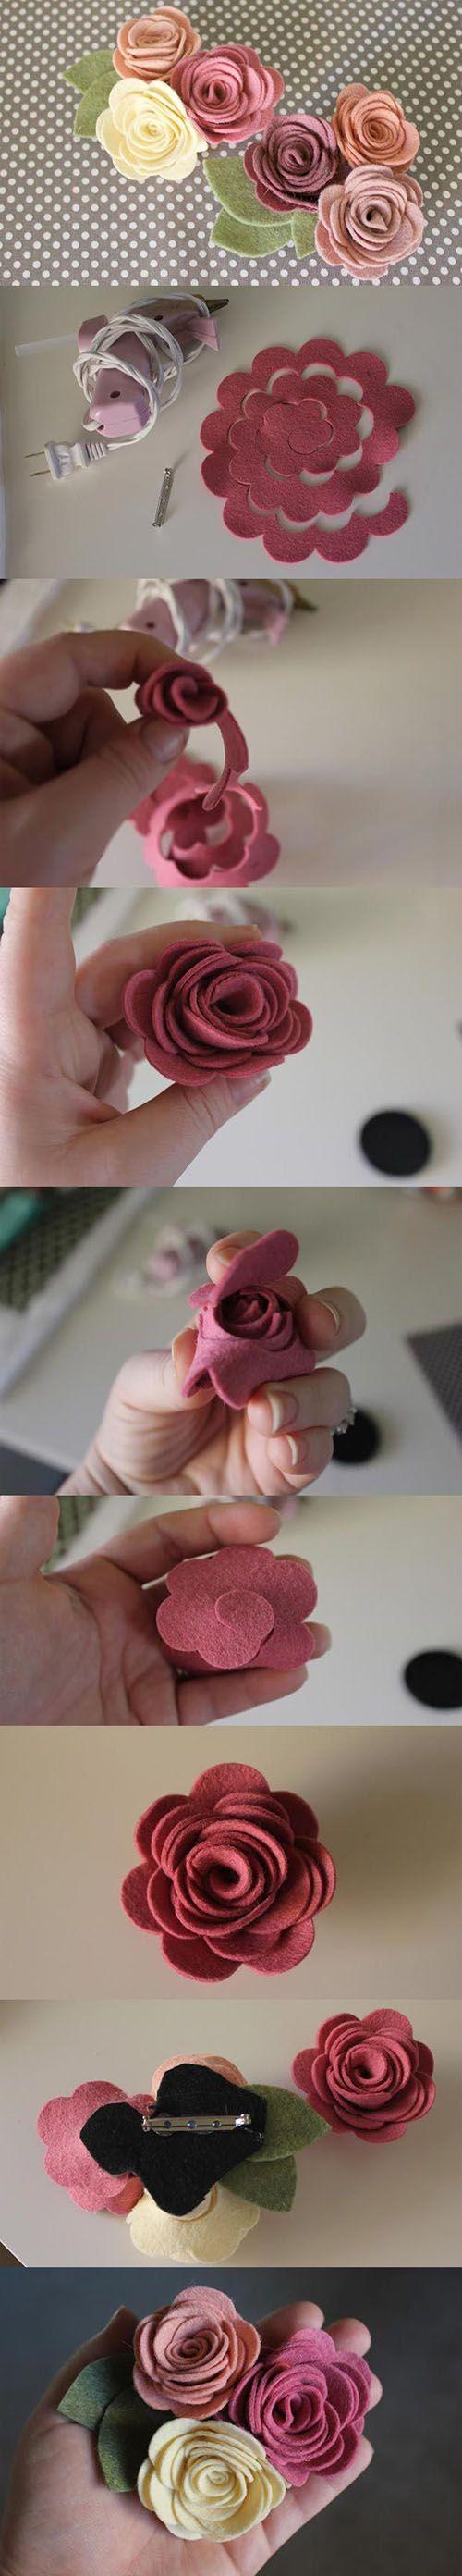 Easy And Beautiful Flower | DIY & Crafts Tutorials